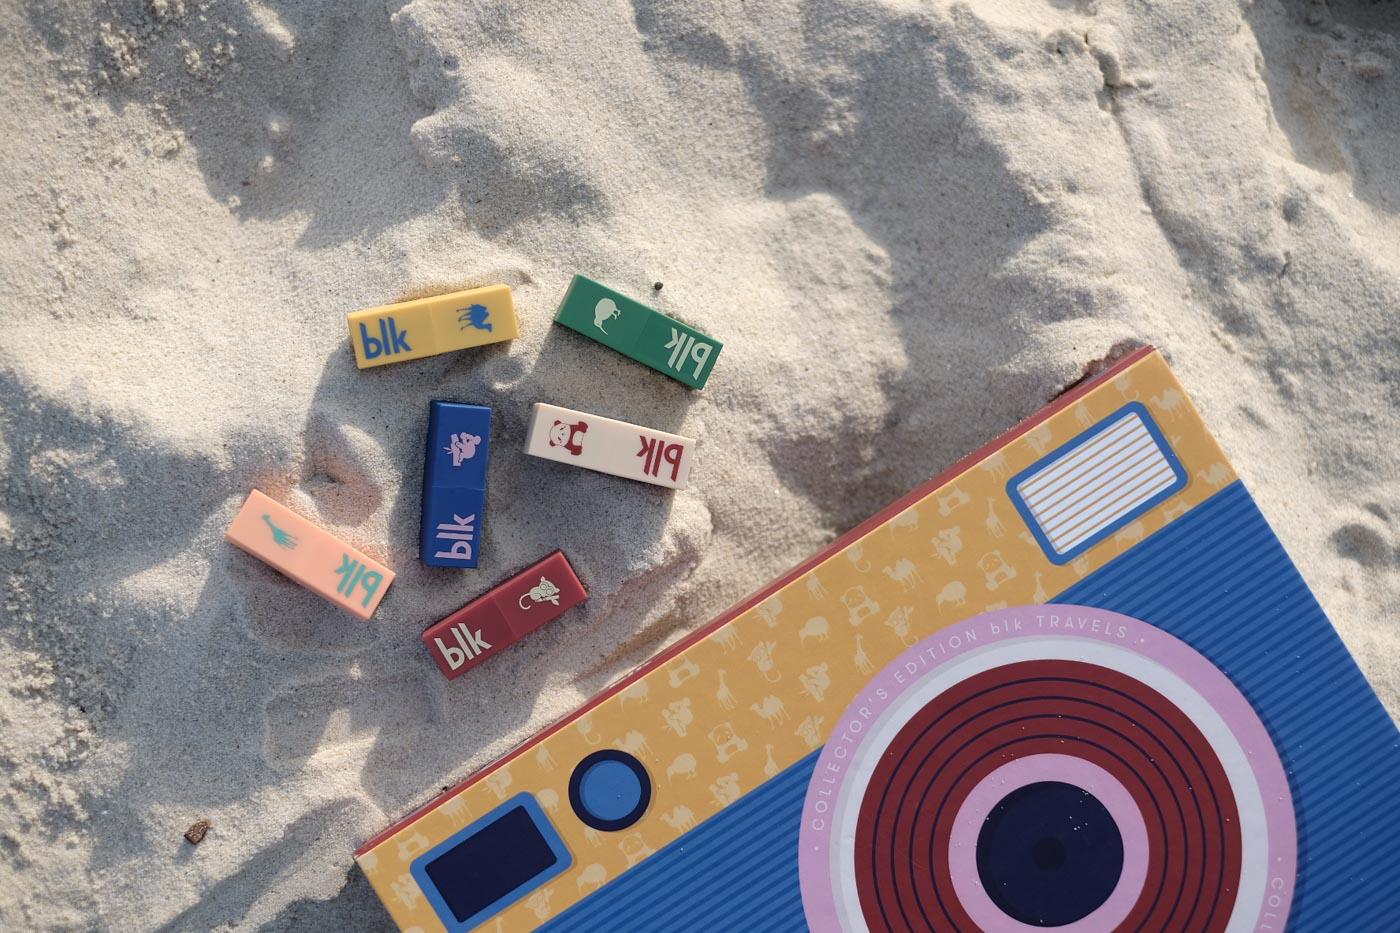 ANYWHERE. The 6 mini-lipsticks can be taken anywhere including Bondi Beach